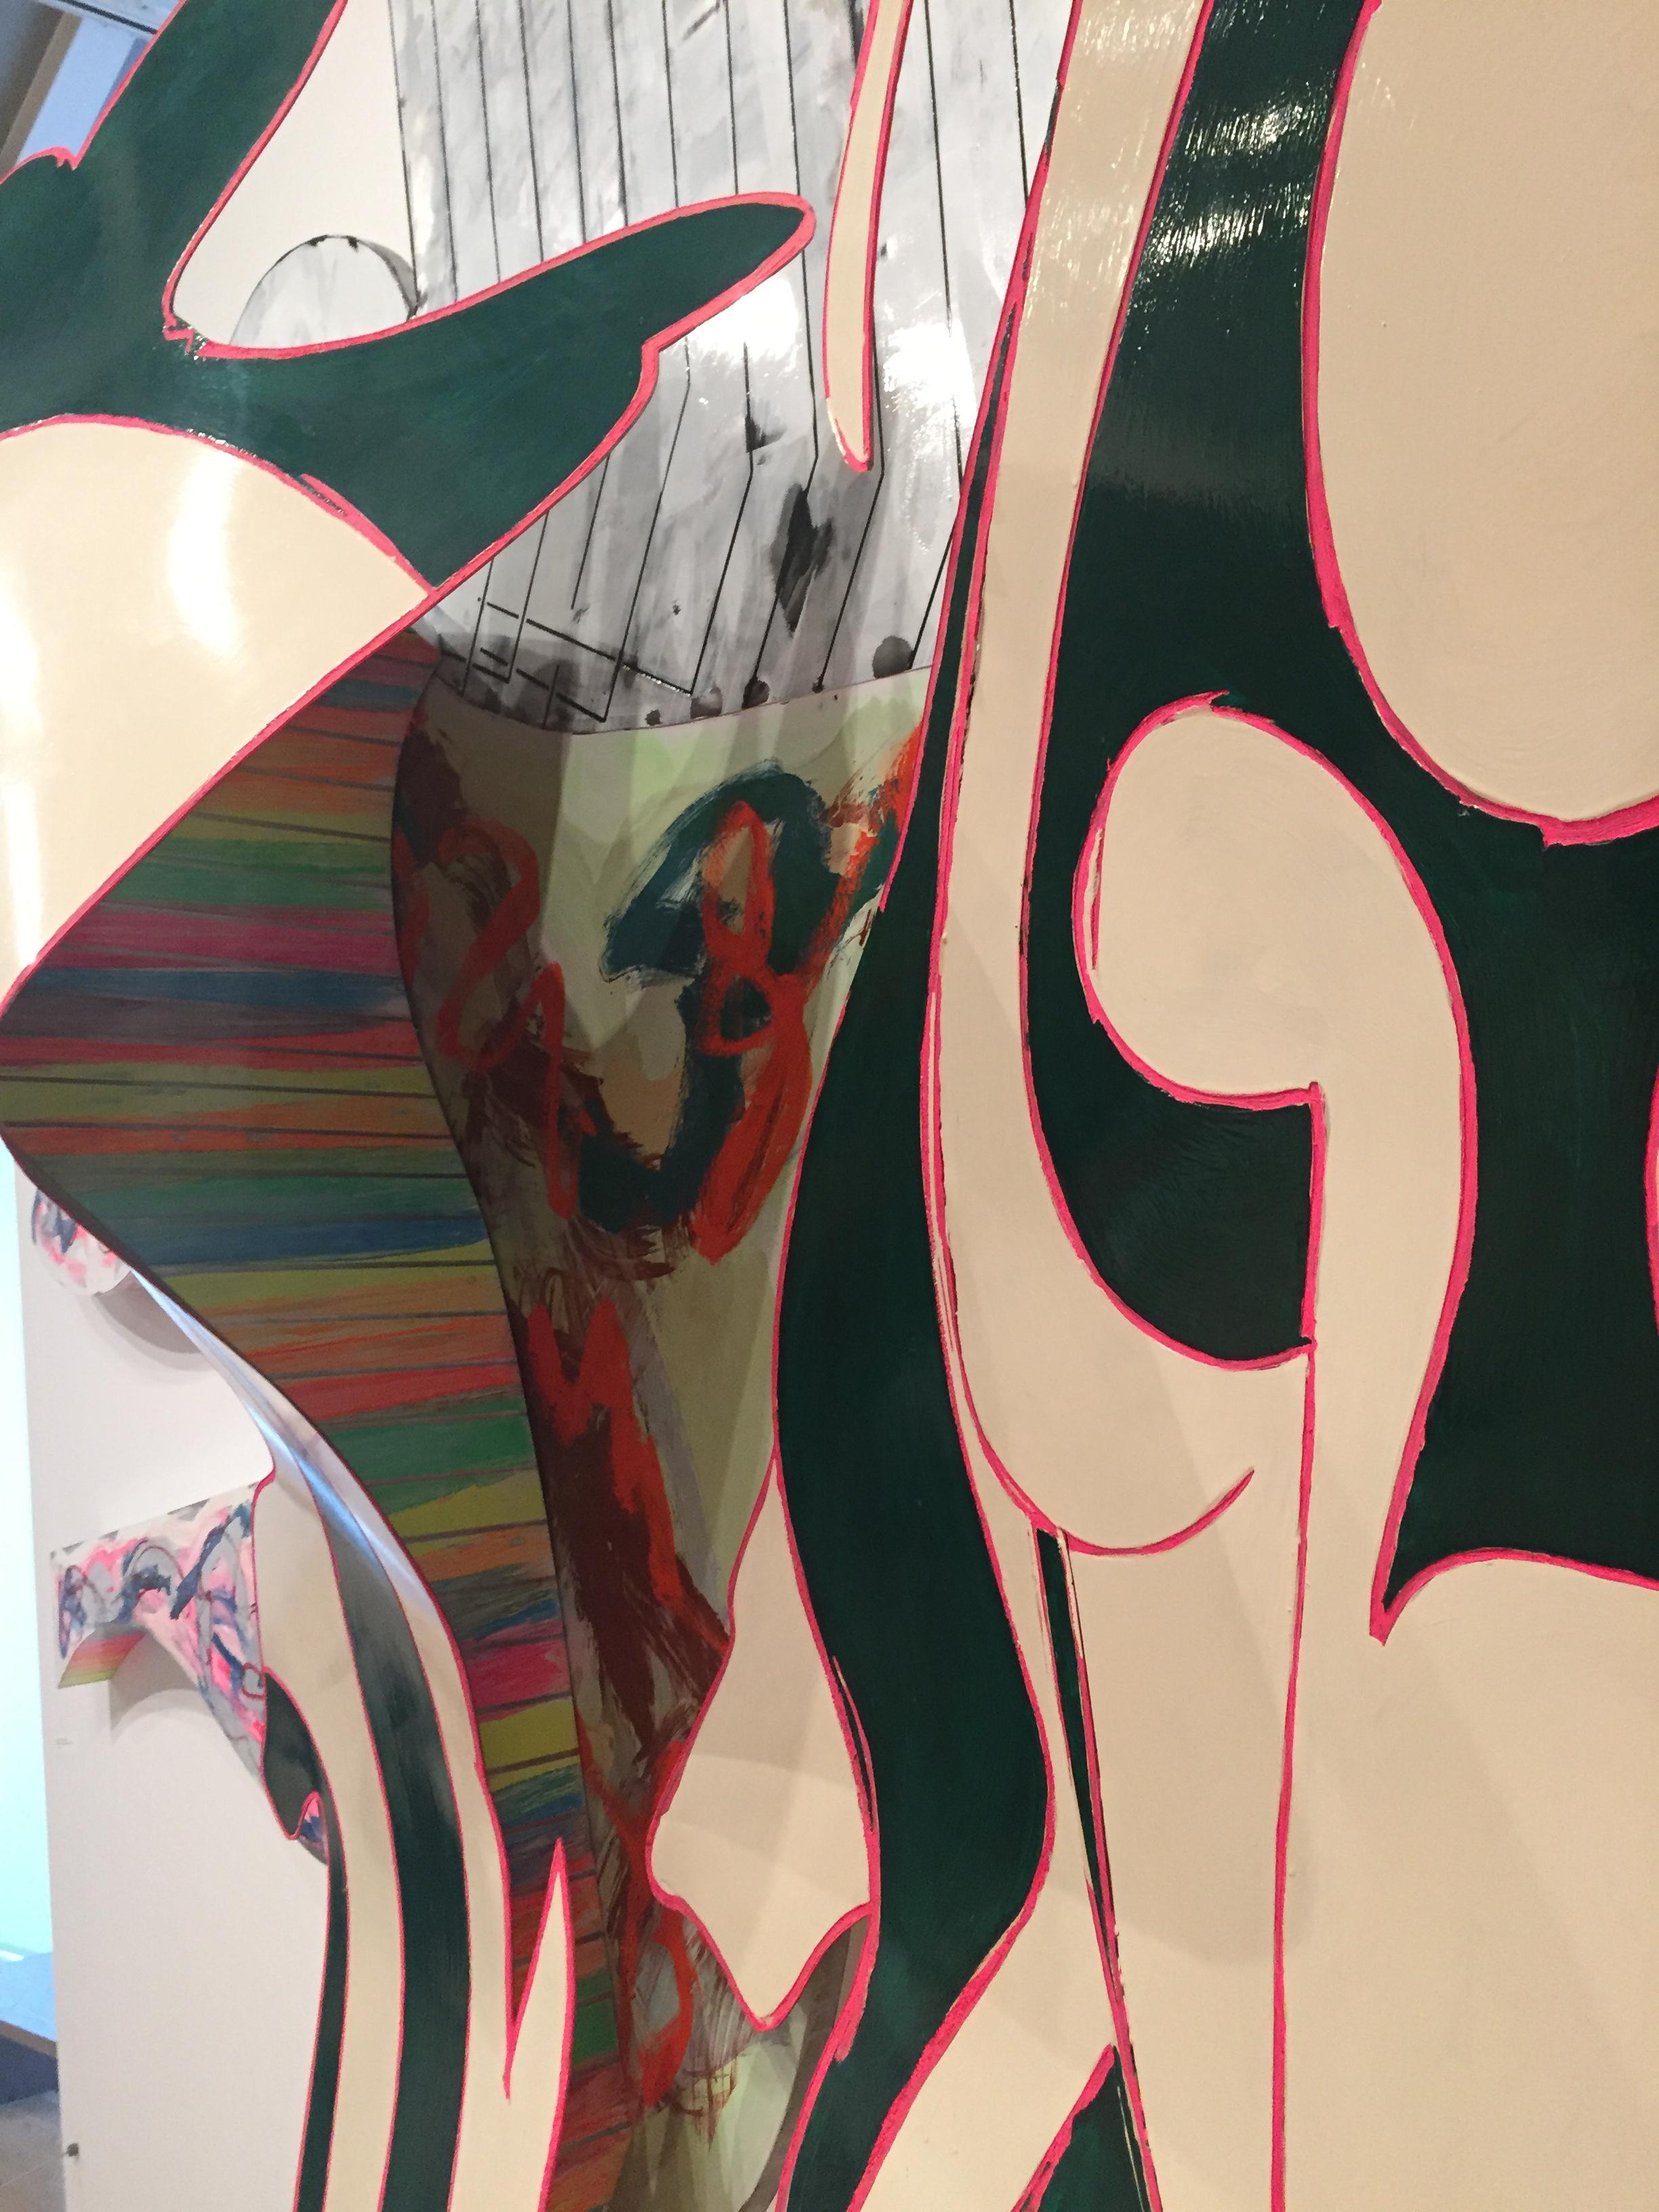 Detail of Frank Stella